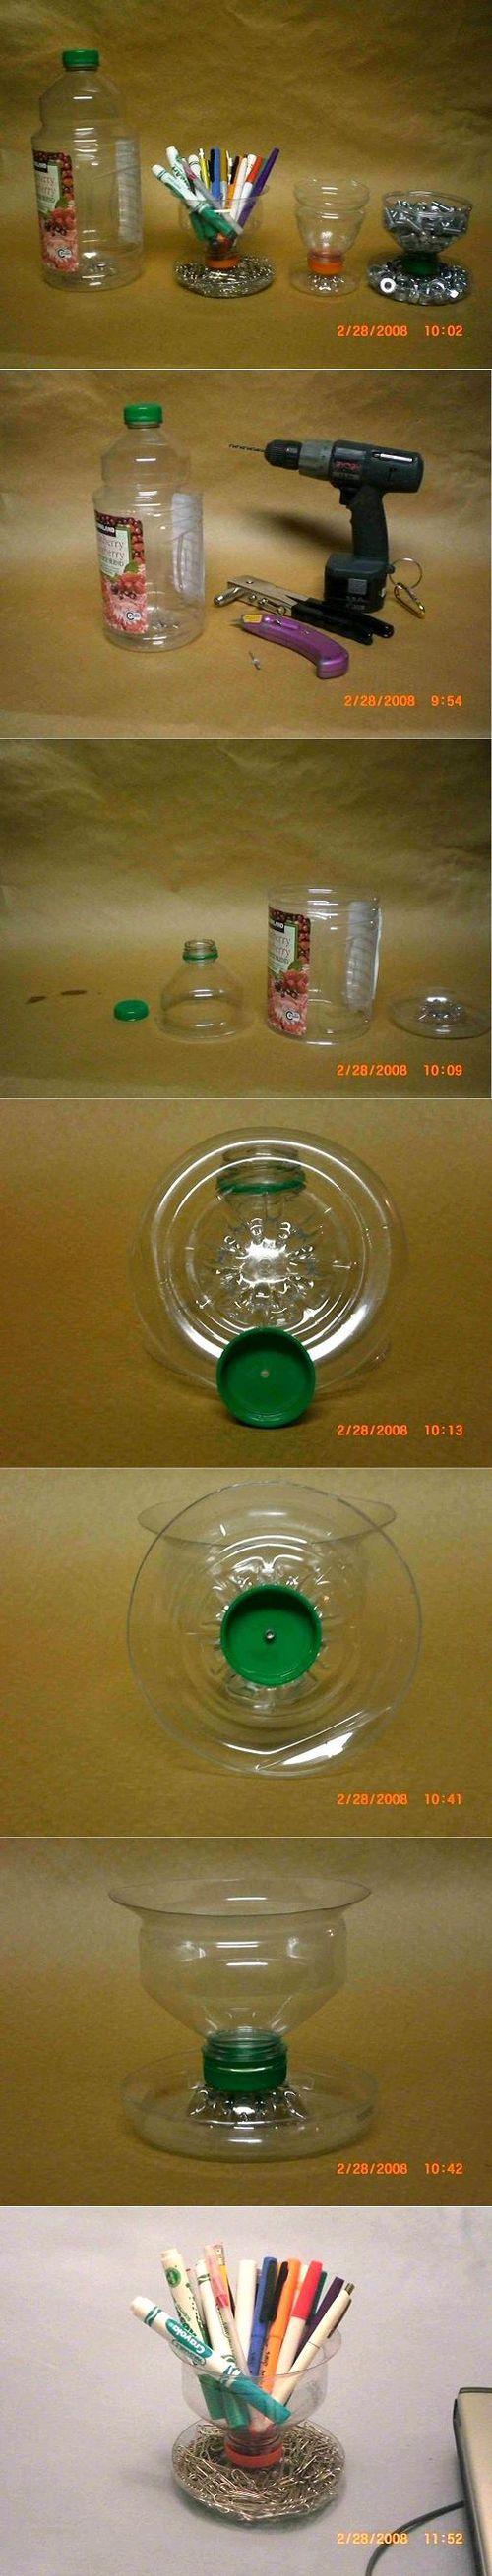 diy plastic bottle pencil and paper clip holder